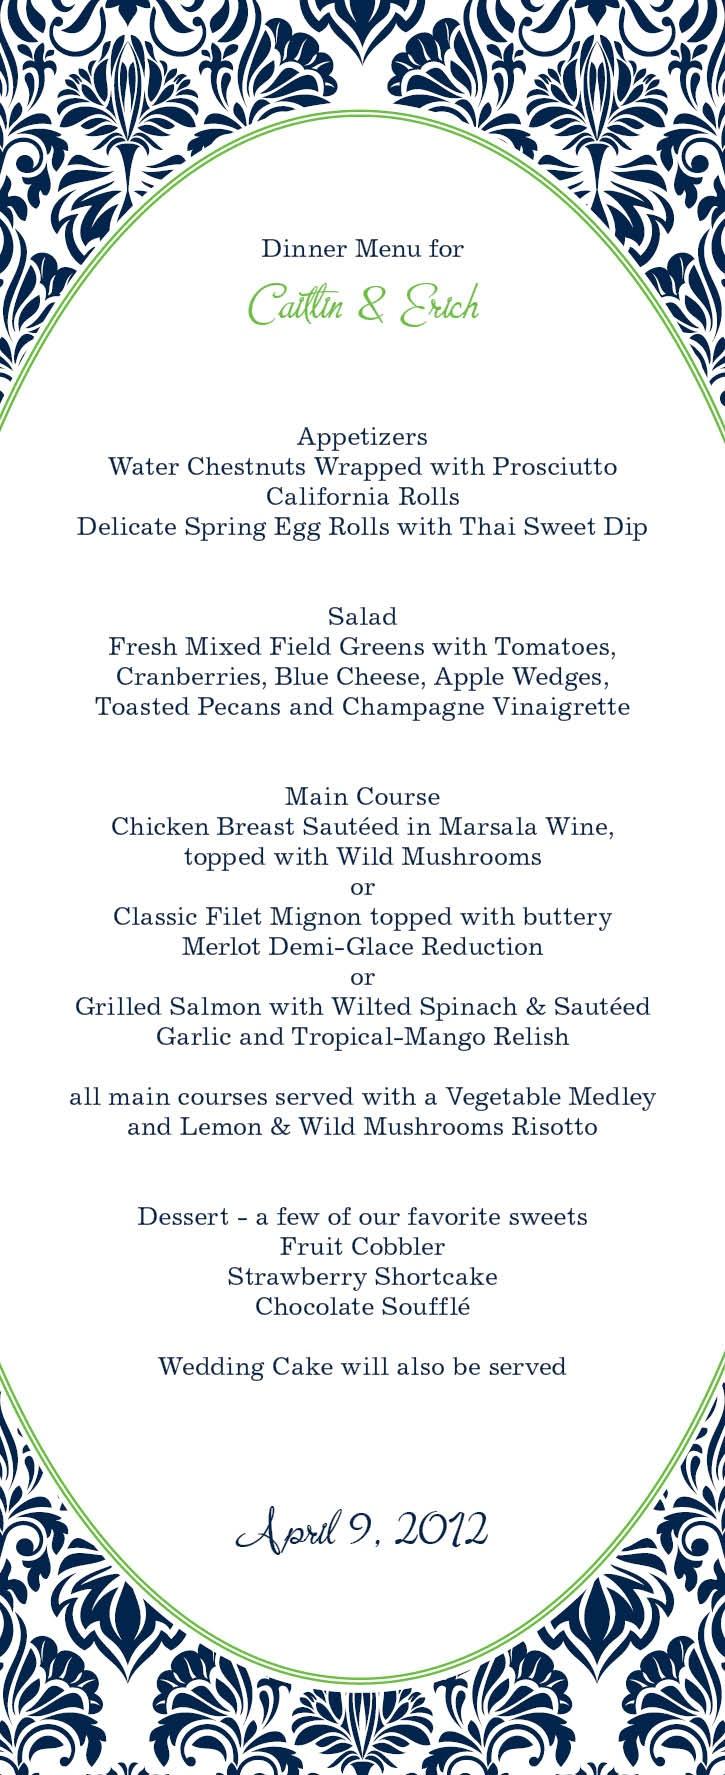 Our menu design from magnetstreet